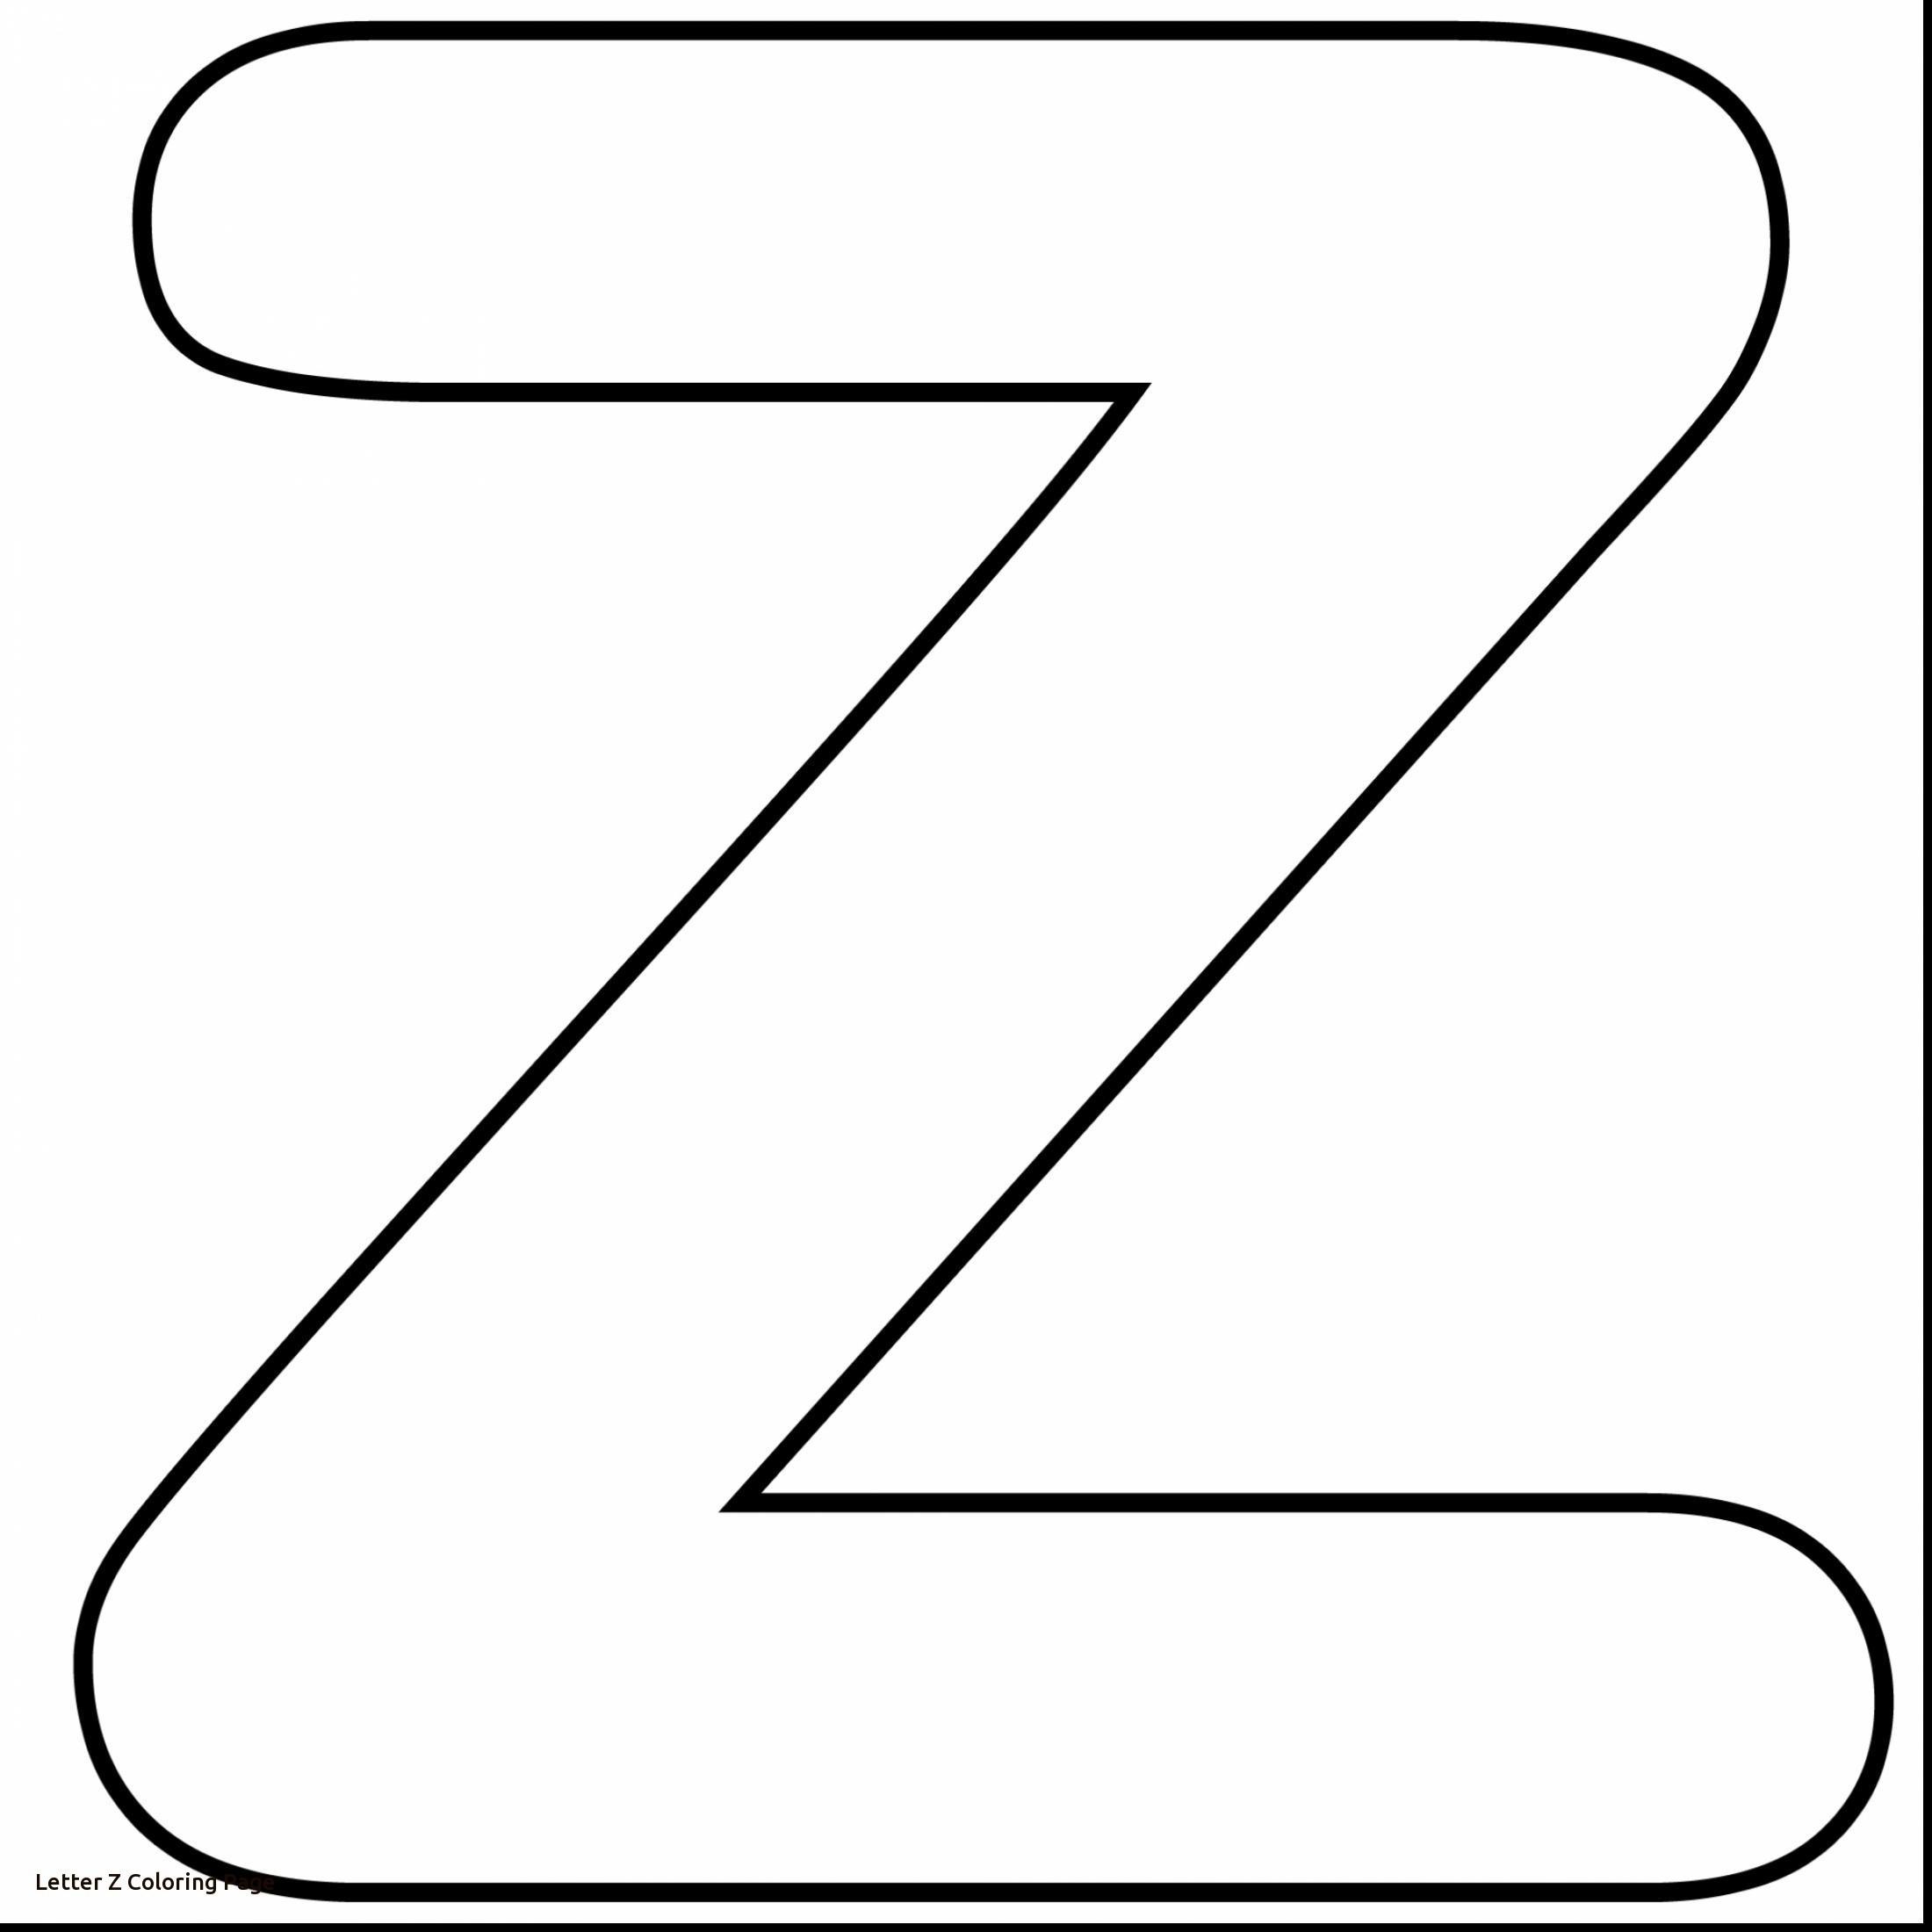 Alphabet clipart a to z, Picture #41153 alphabet clipart a to z.